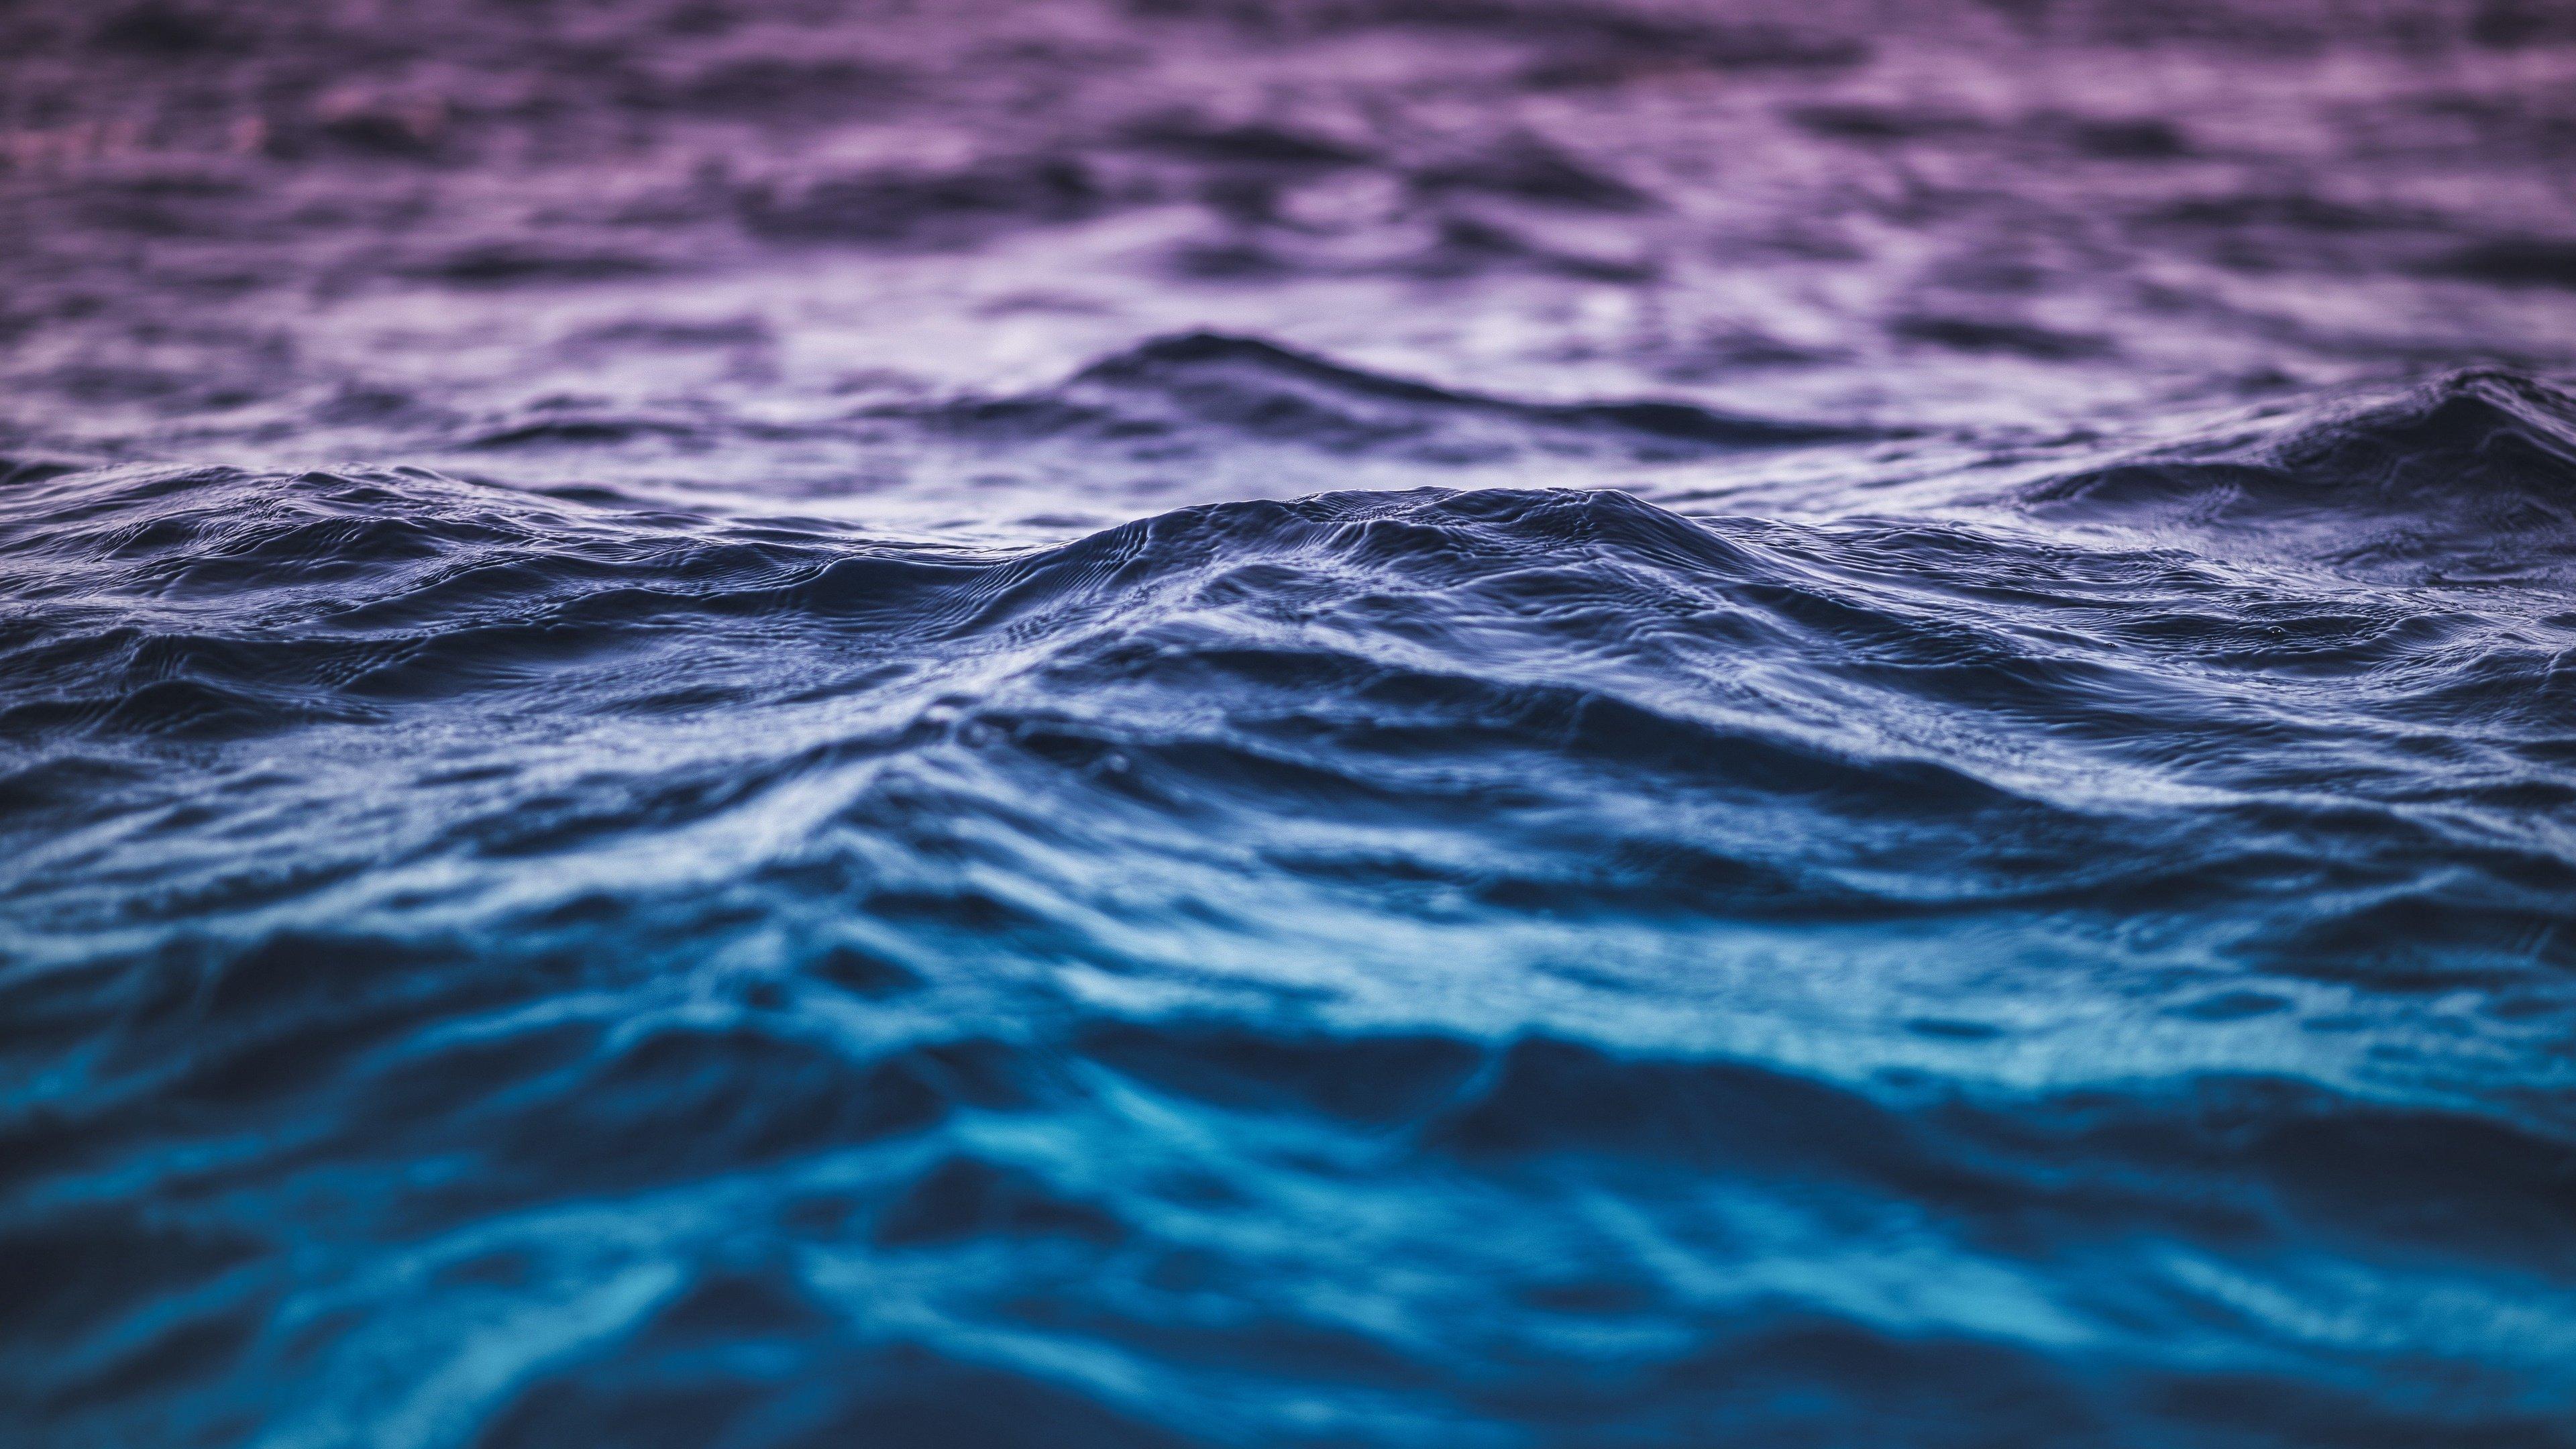 Blue And Purple Gradient Waves Wallpaper 4k Ultra Hd Id 3453